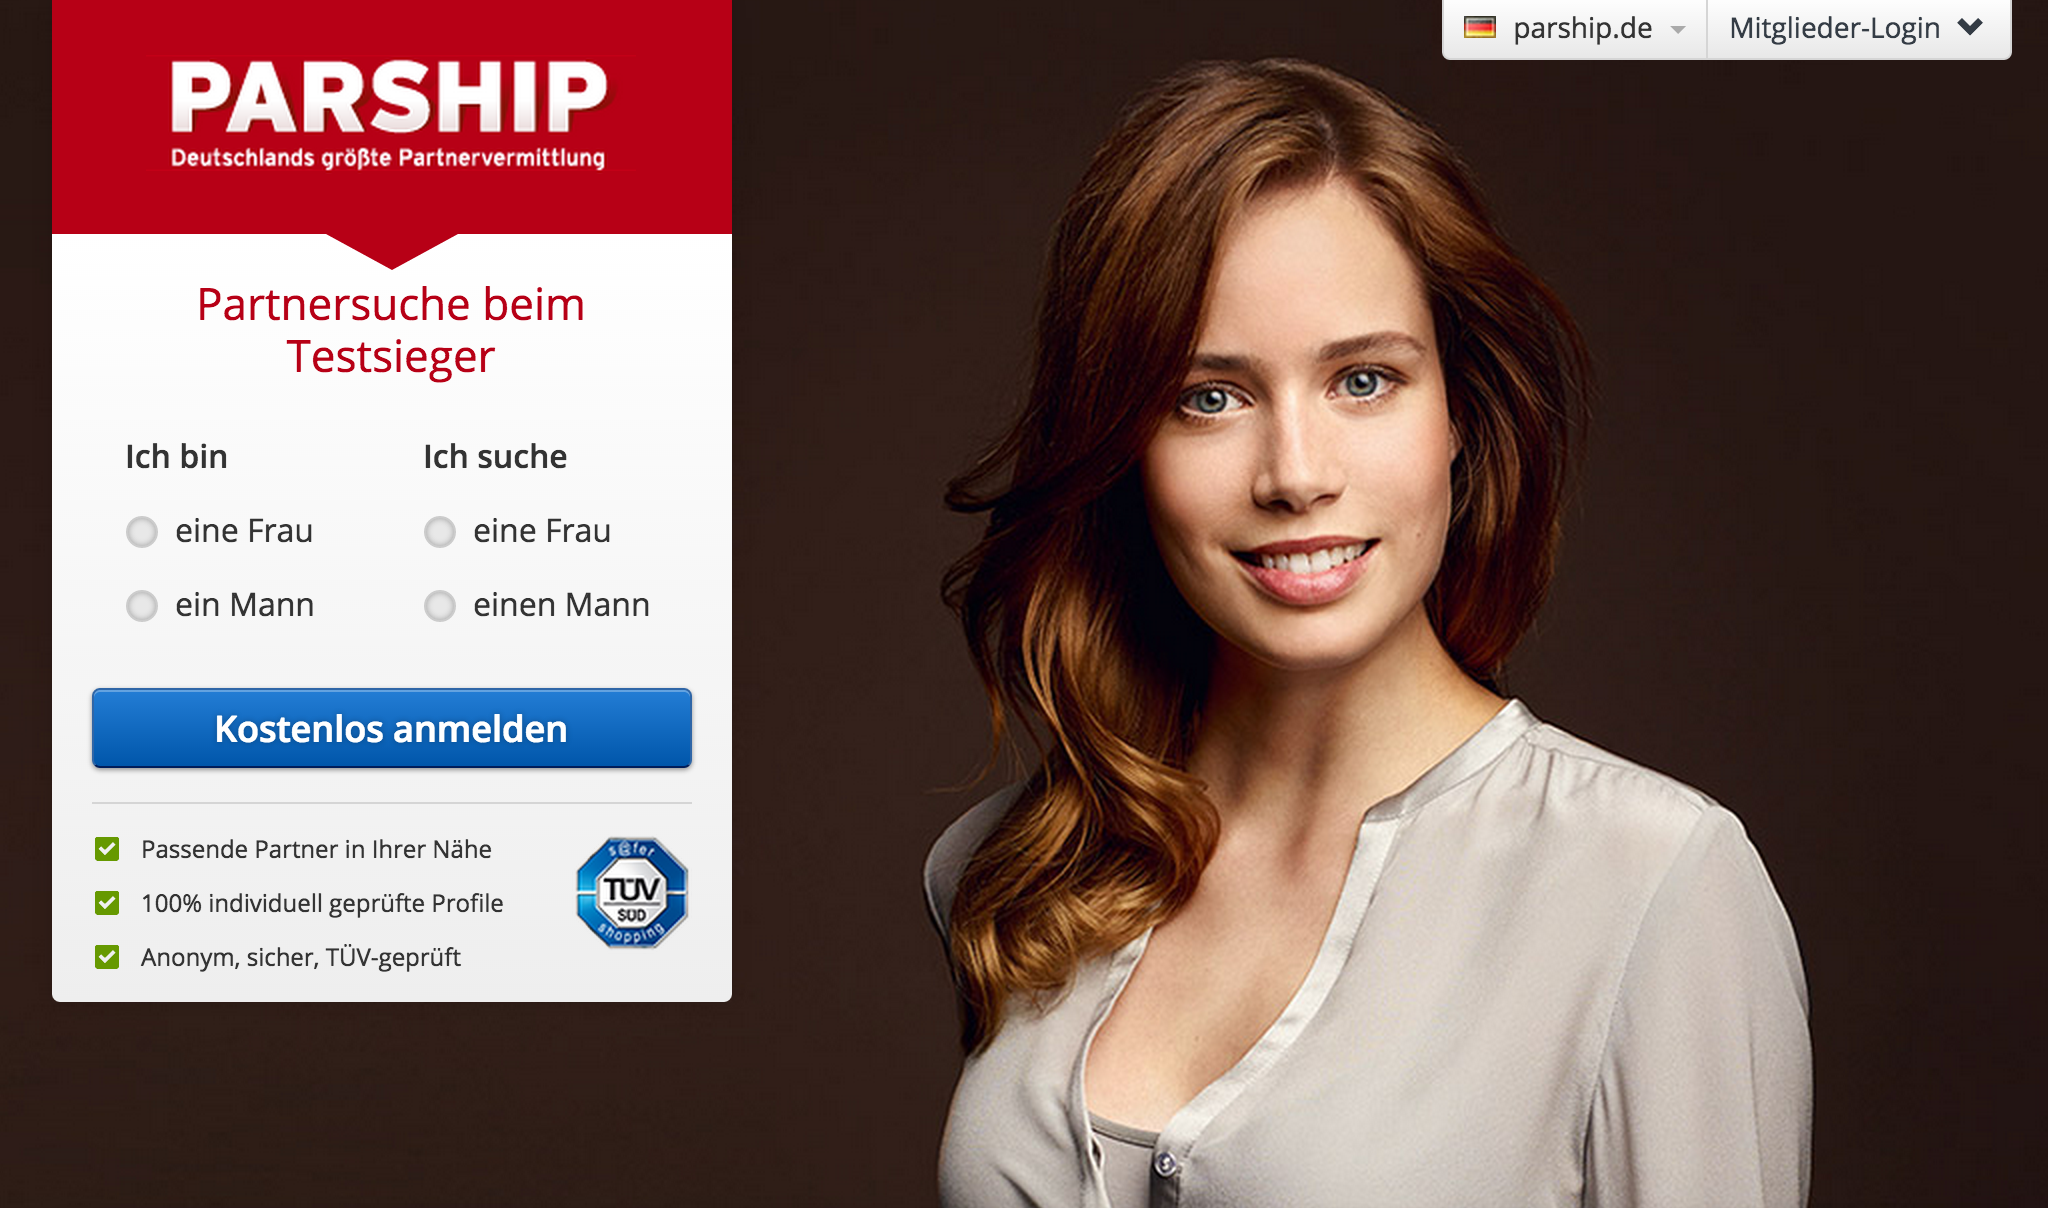 Online dating market size europe